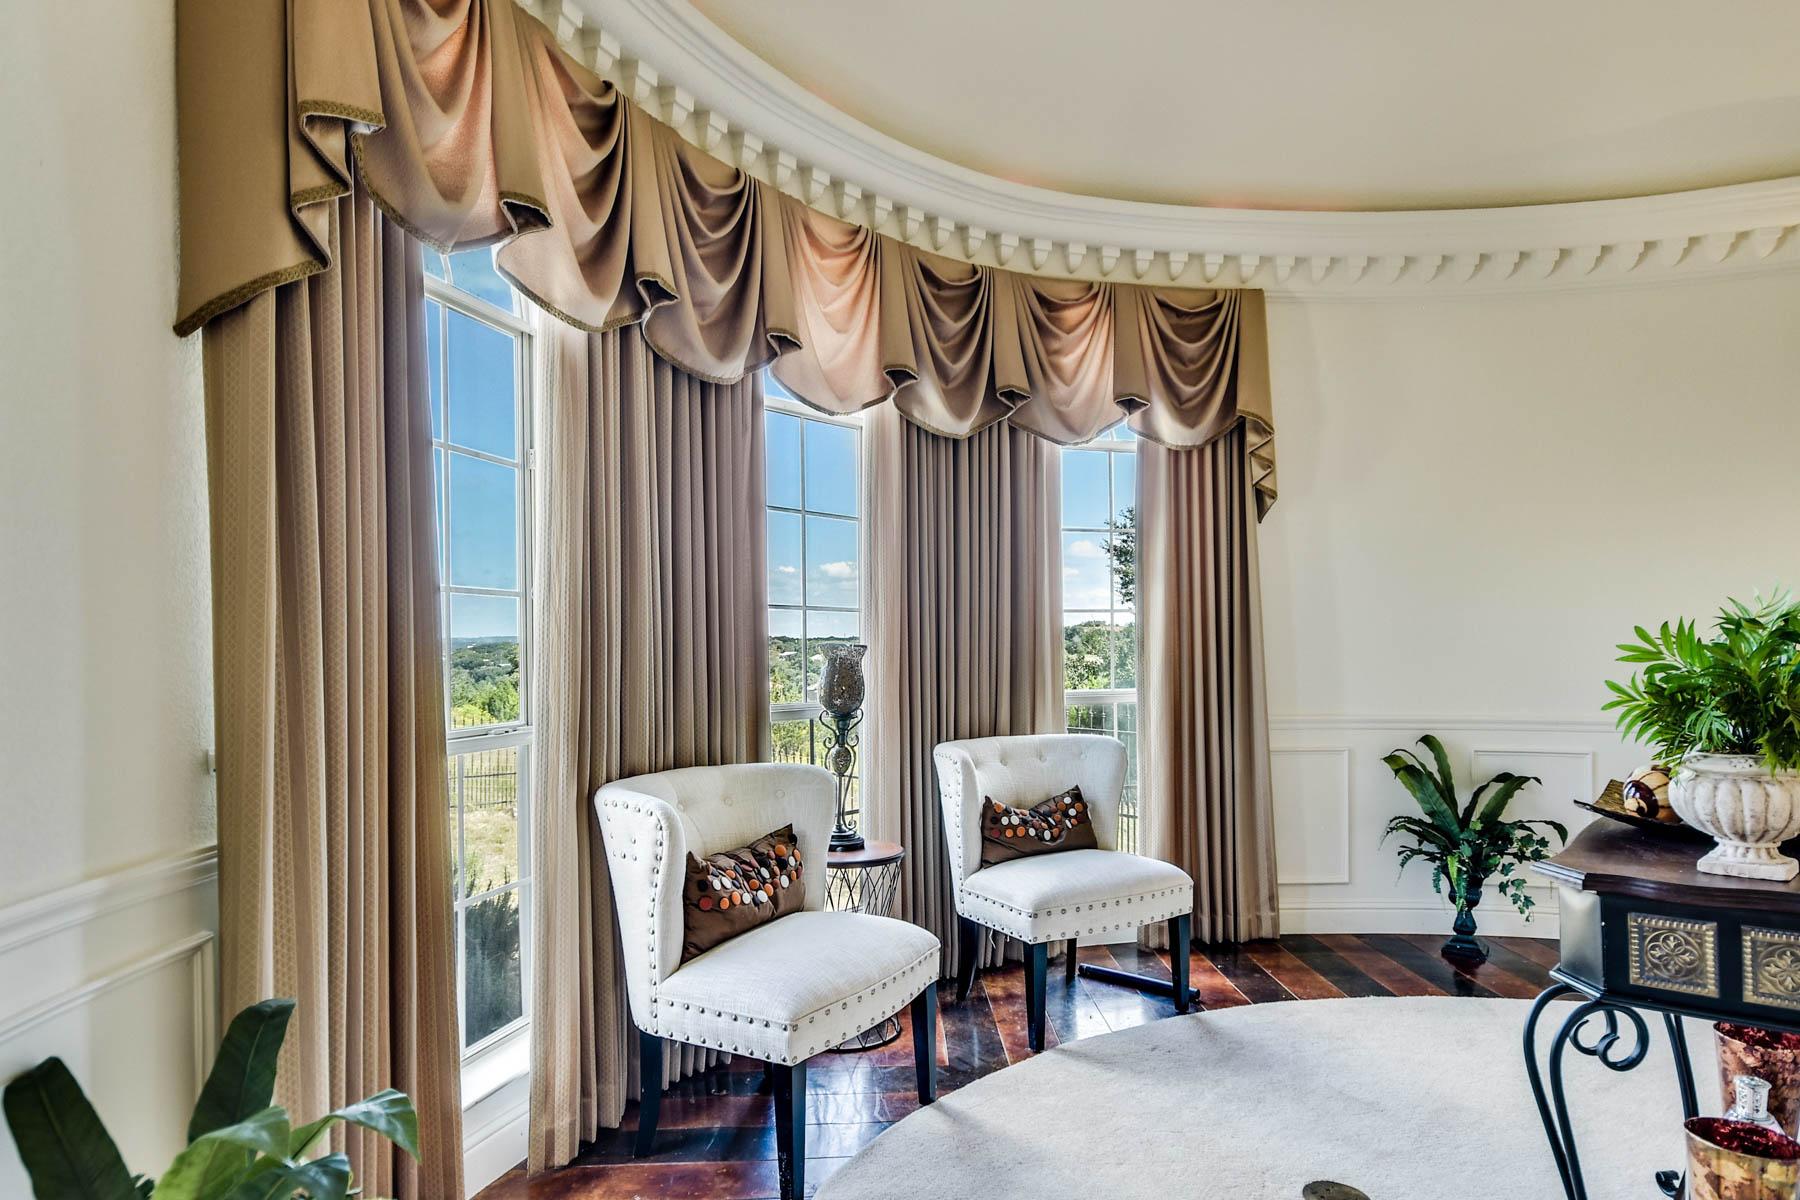 Additional photo for property listing at Lake Views in Oak Shores Estates 195 Scarlet Ct Canyon Lake, Texas 78133 Estados Unidos